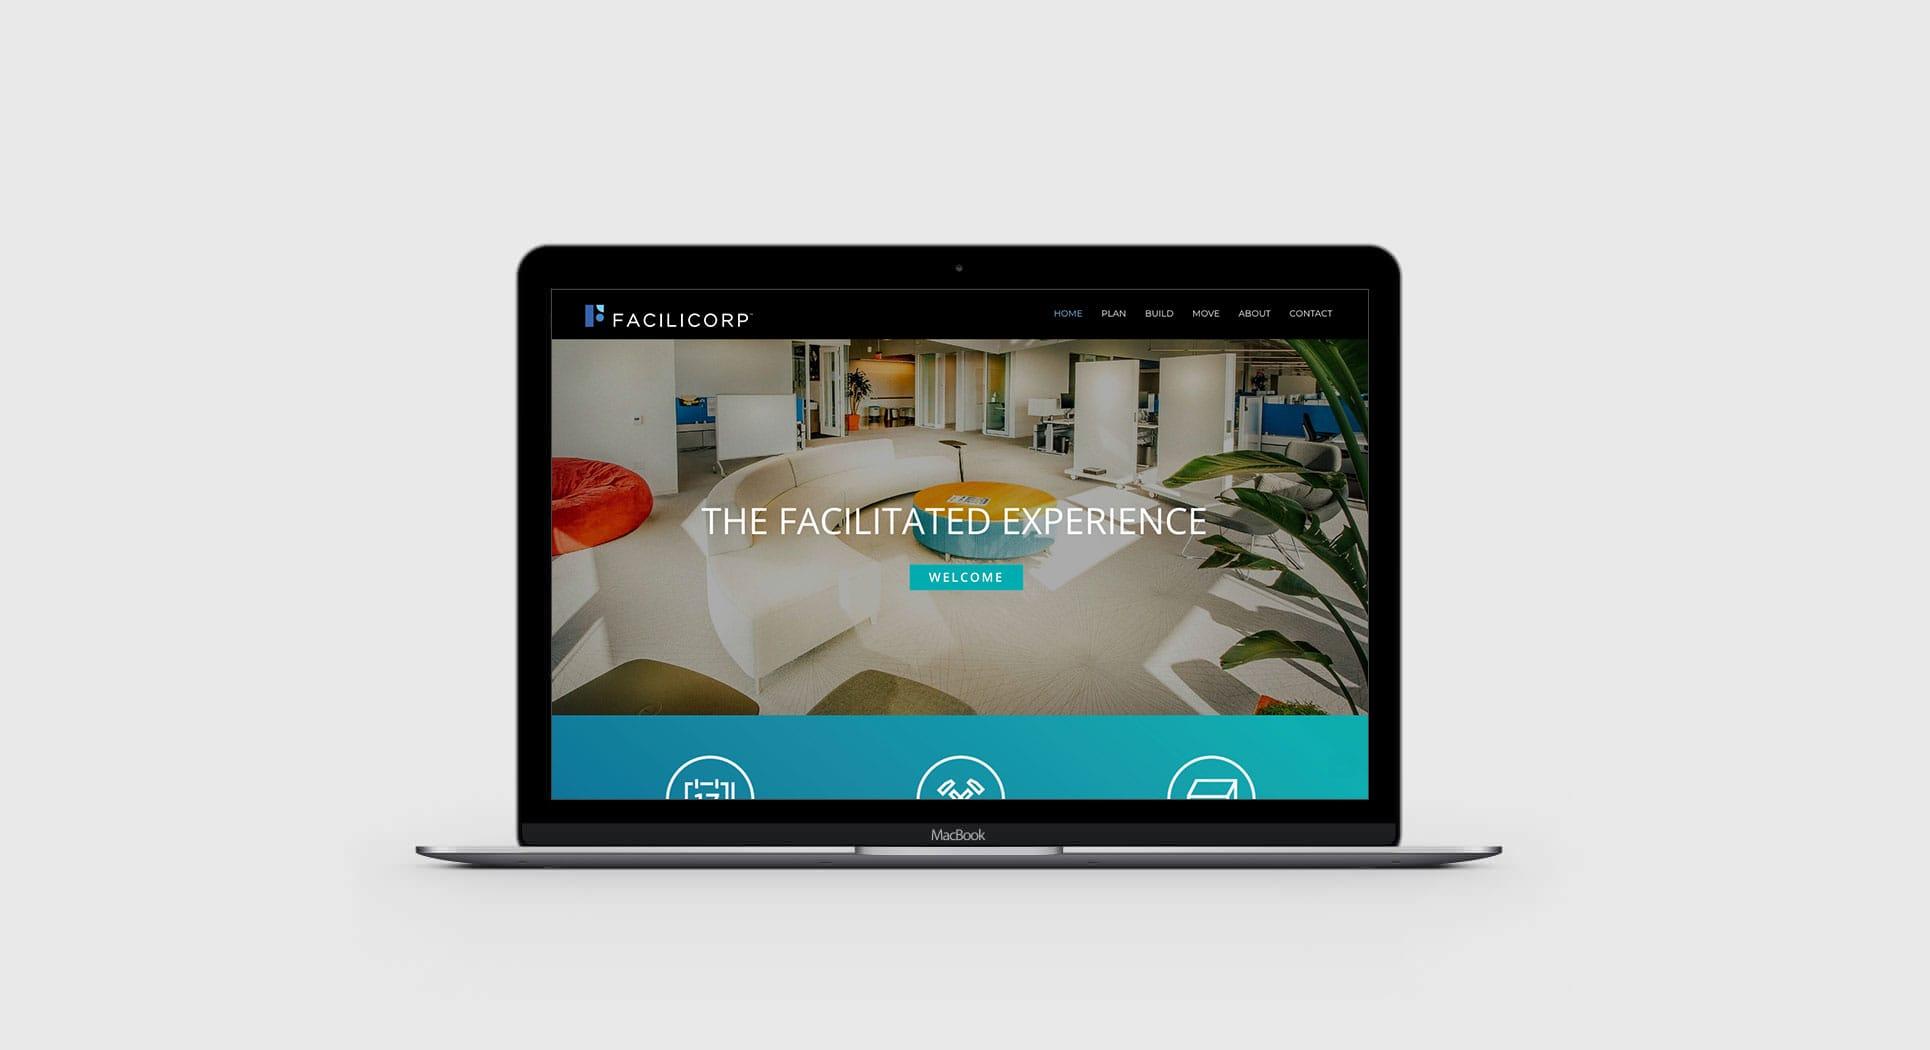 WordPress website design expertise in San Jose, CA shown on laptop